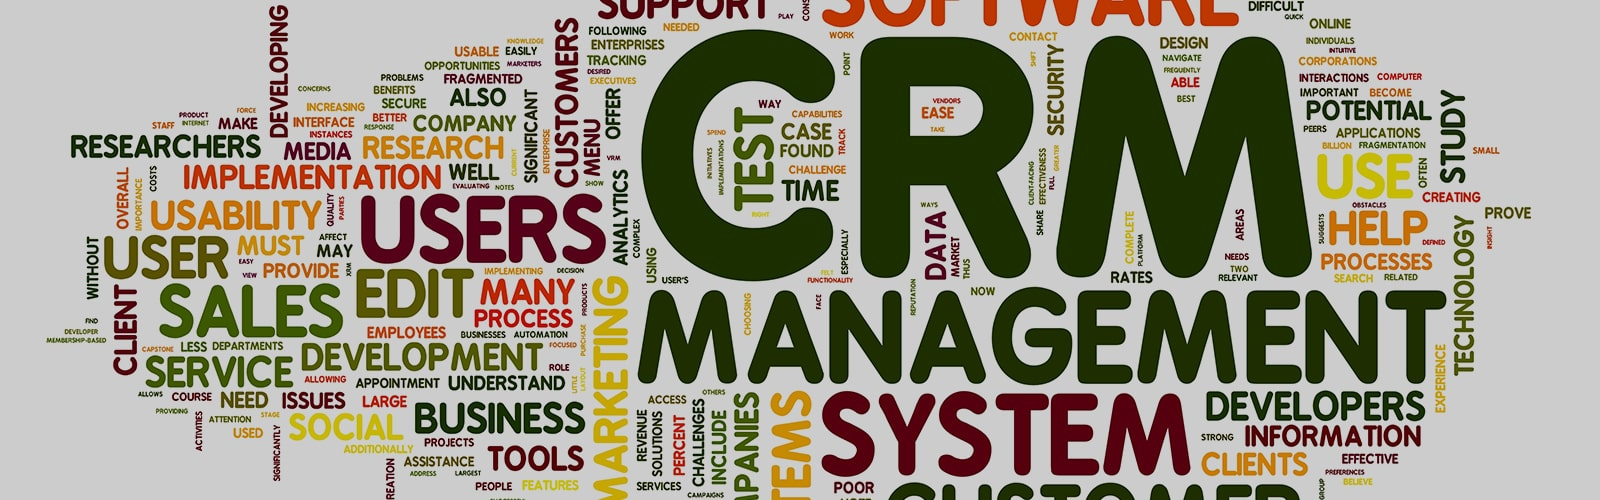 Cloud-based loyalty CRM